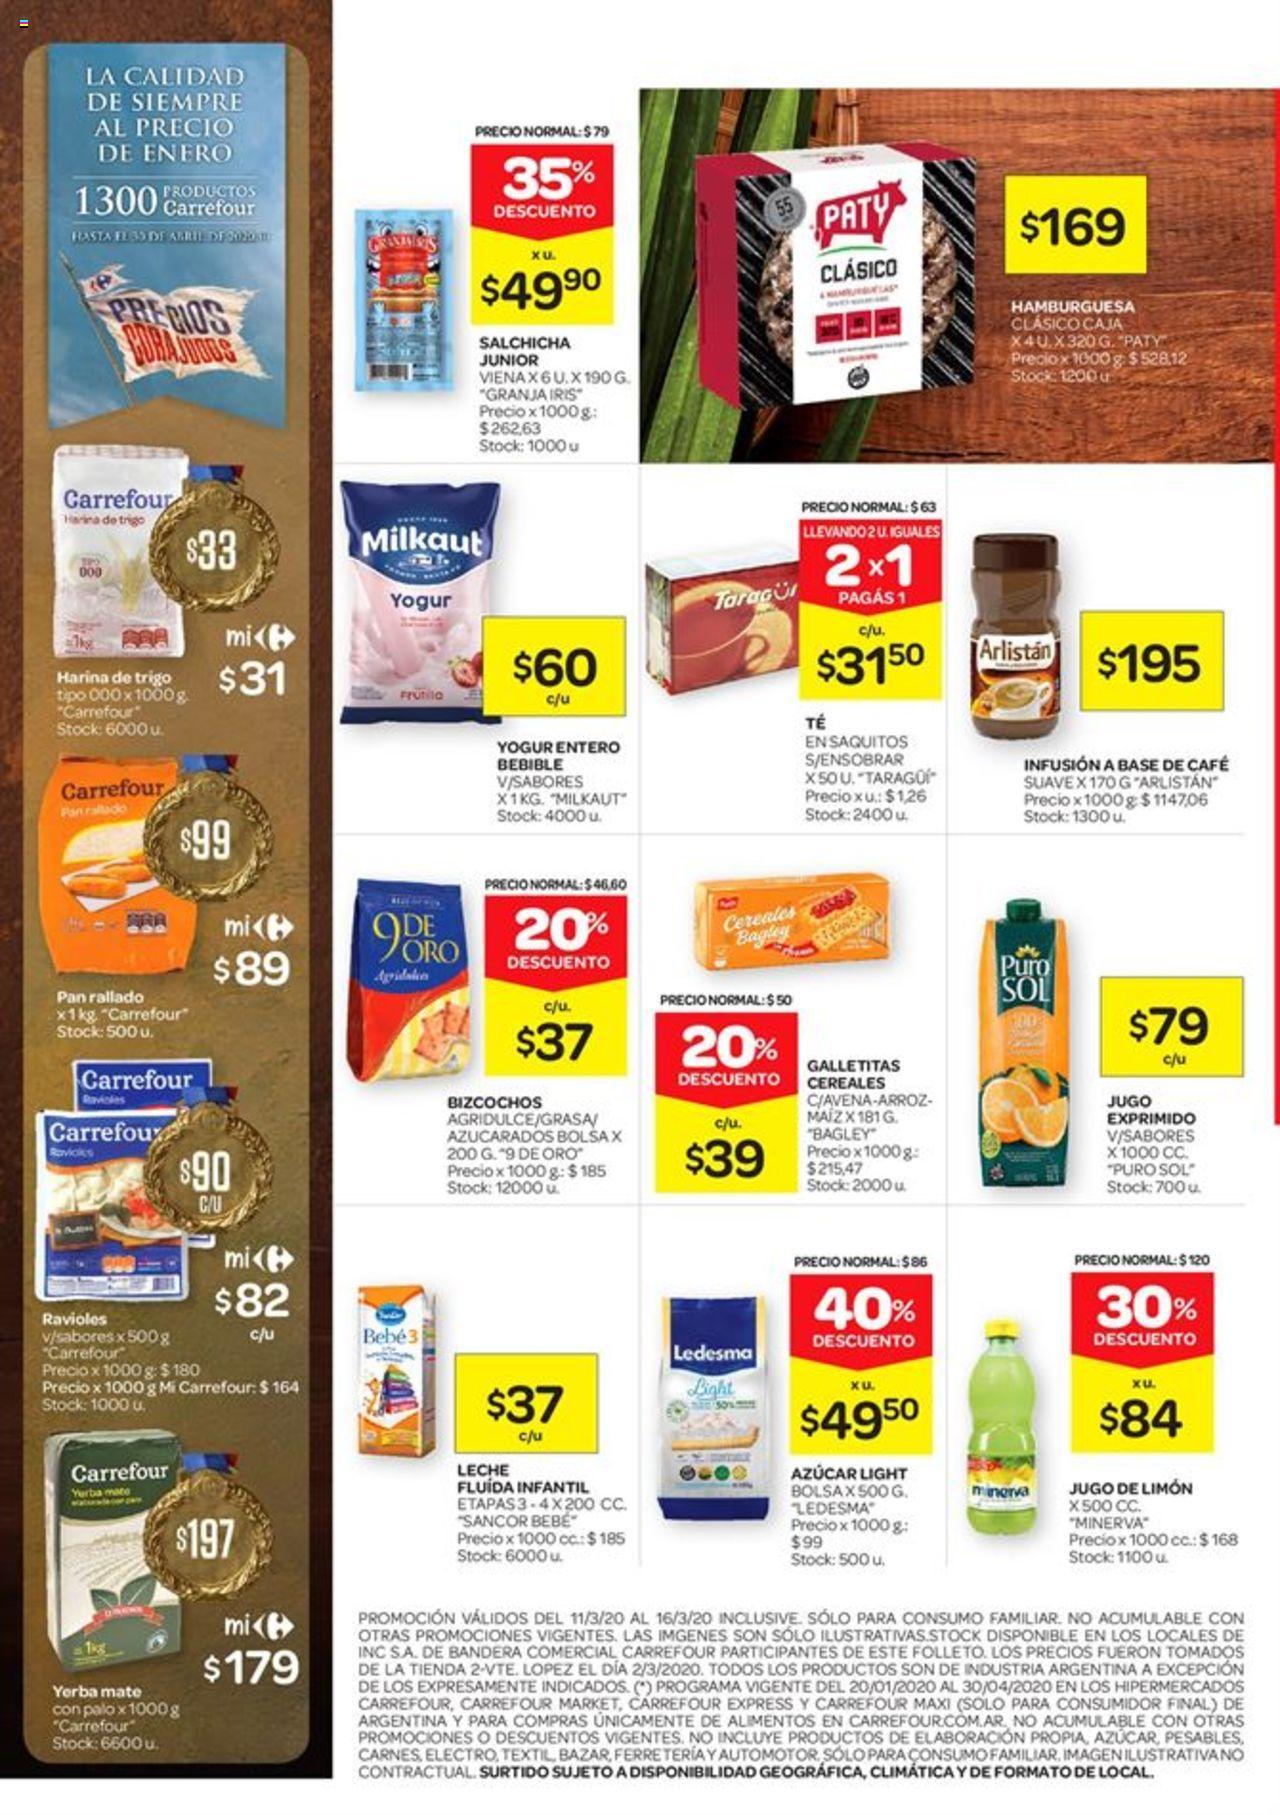 Carrefour - Catálogo válido desde el 11/03/2020 número de página 1 | Página: 2